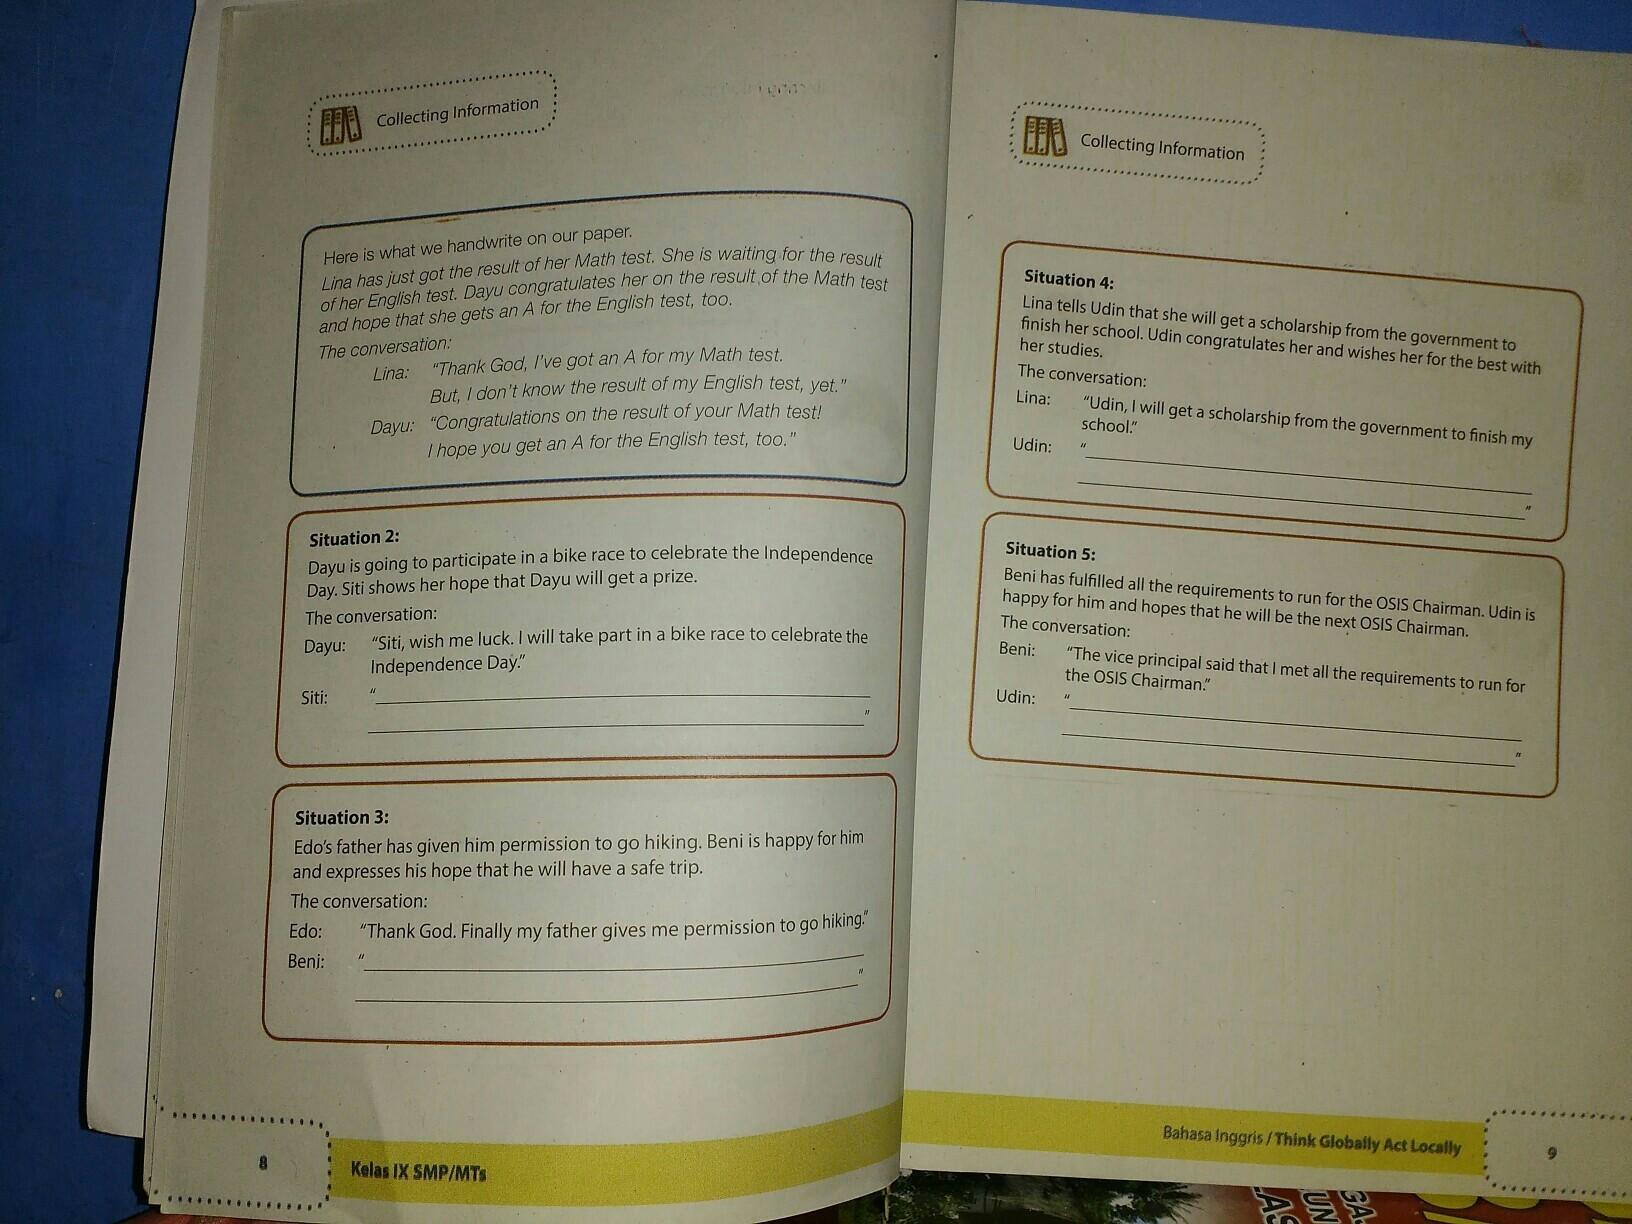 Collecting Information Kelas 9 Halaman 8 9 Brainly Co Id